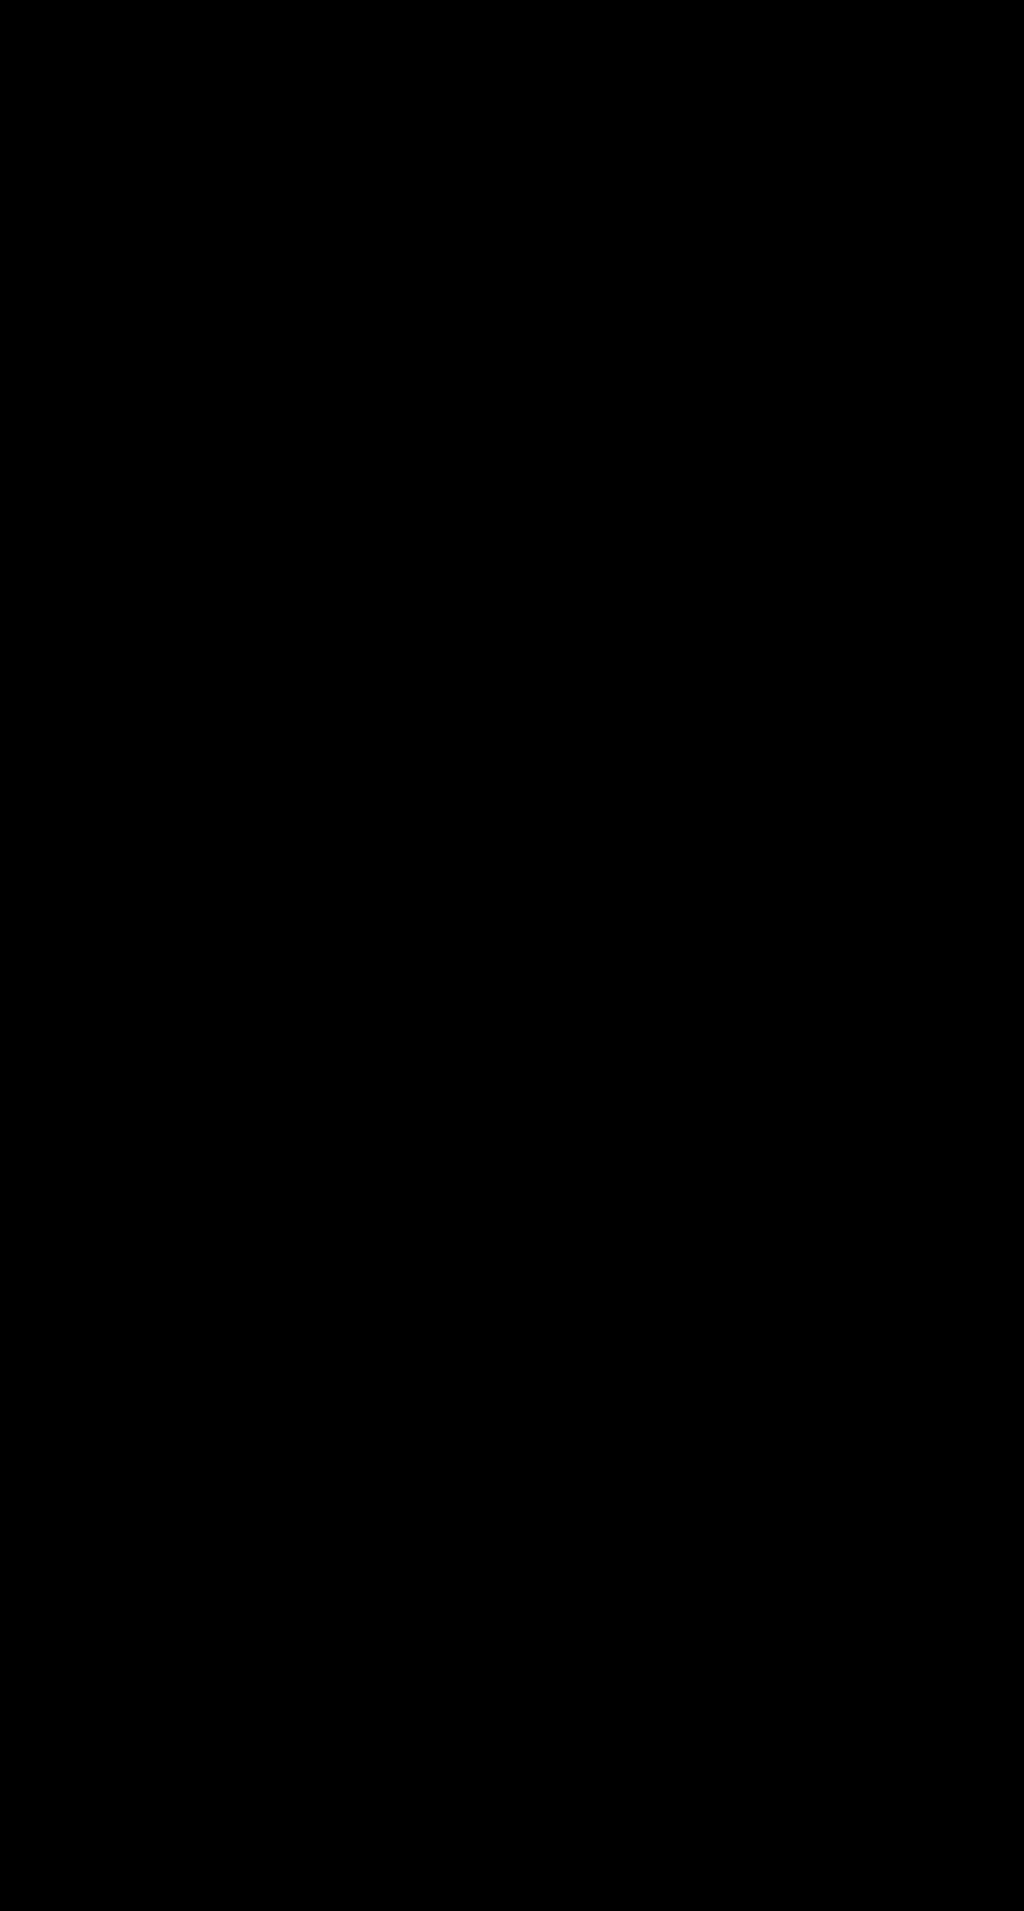 Kirito Lineart : Kirito chibi lineart by tobeyd on deviantart